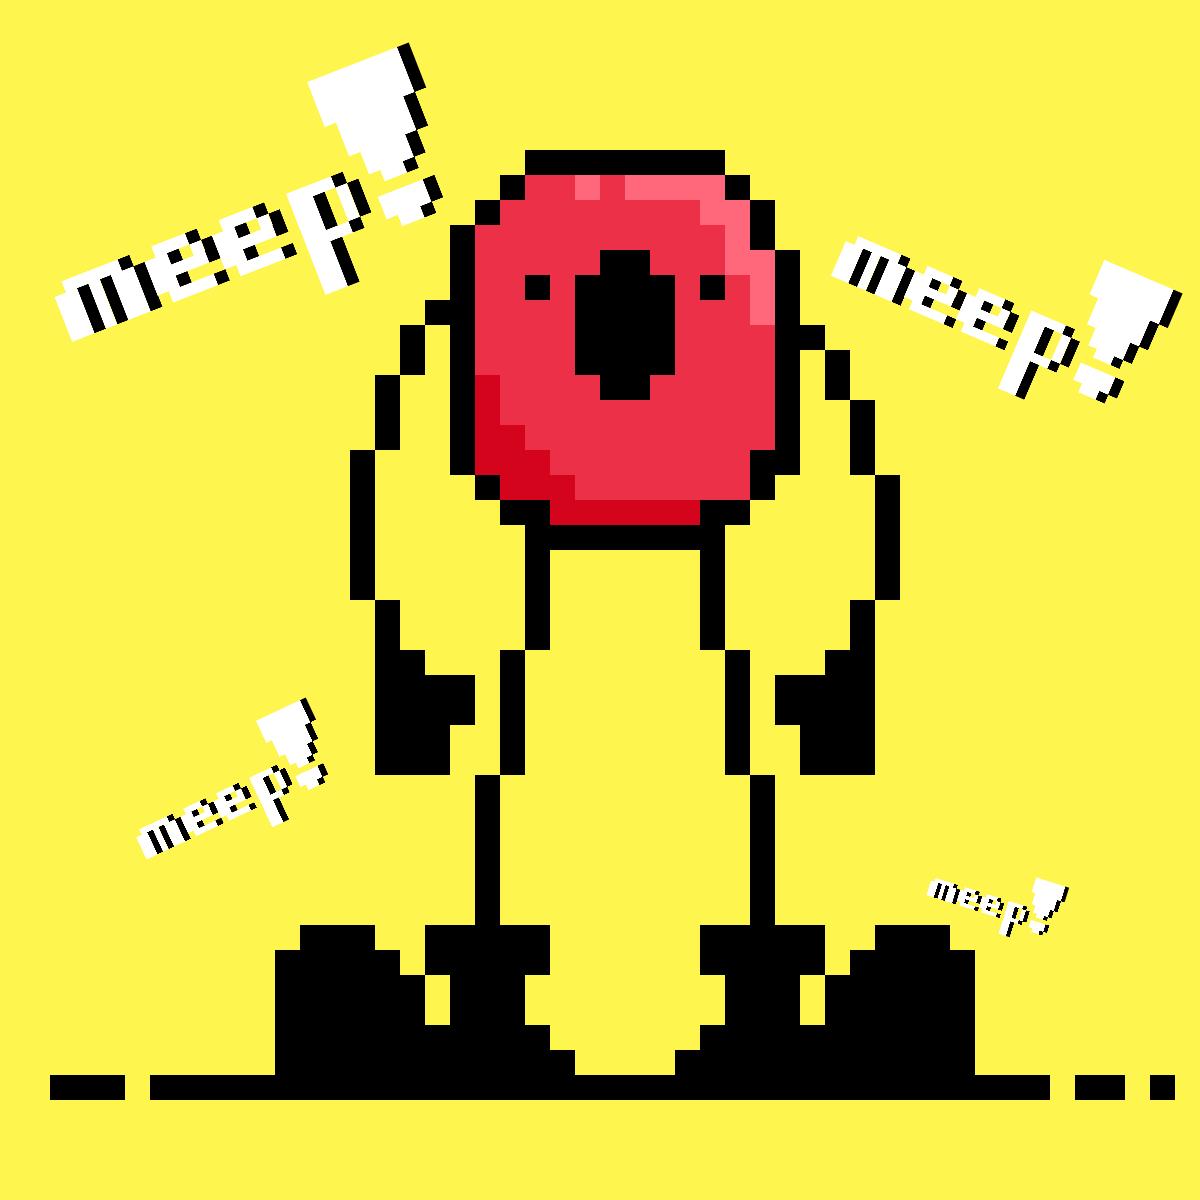 Meep man